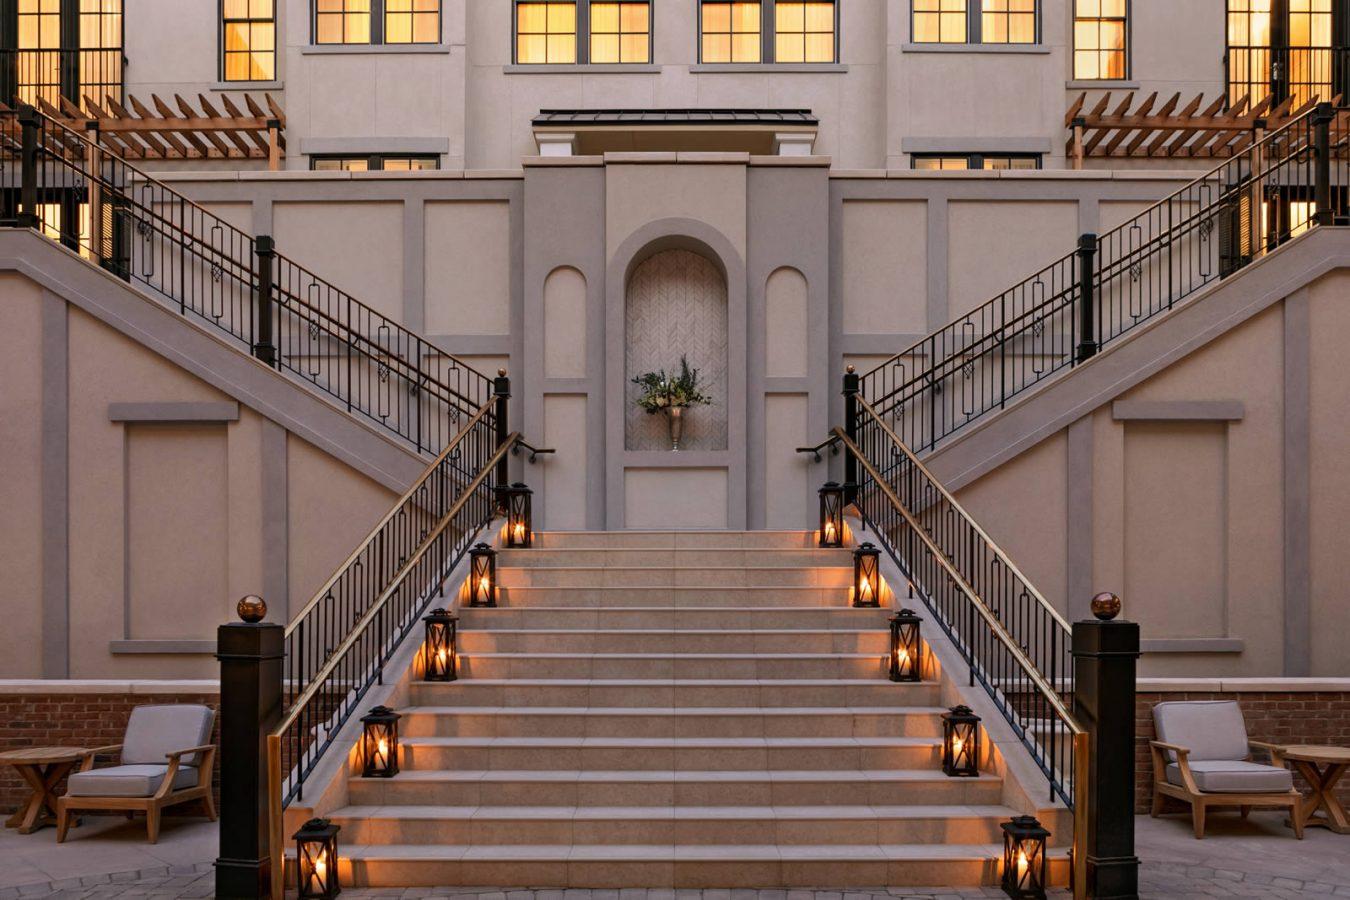 Outdoor terrace staircase